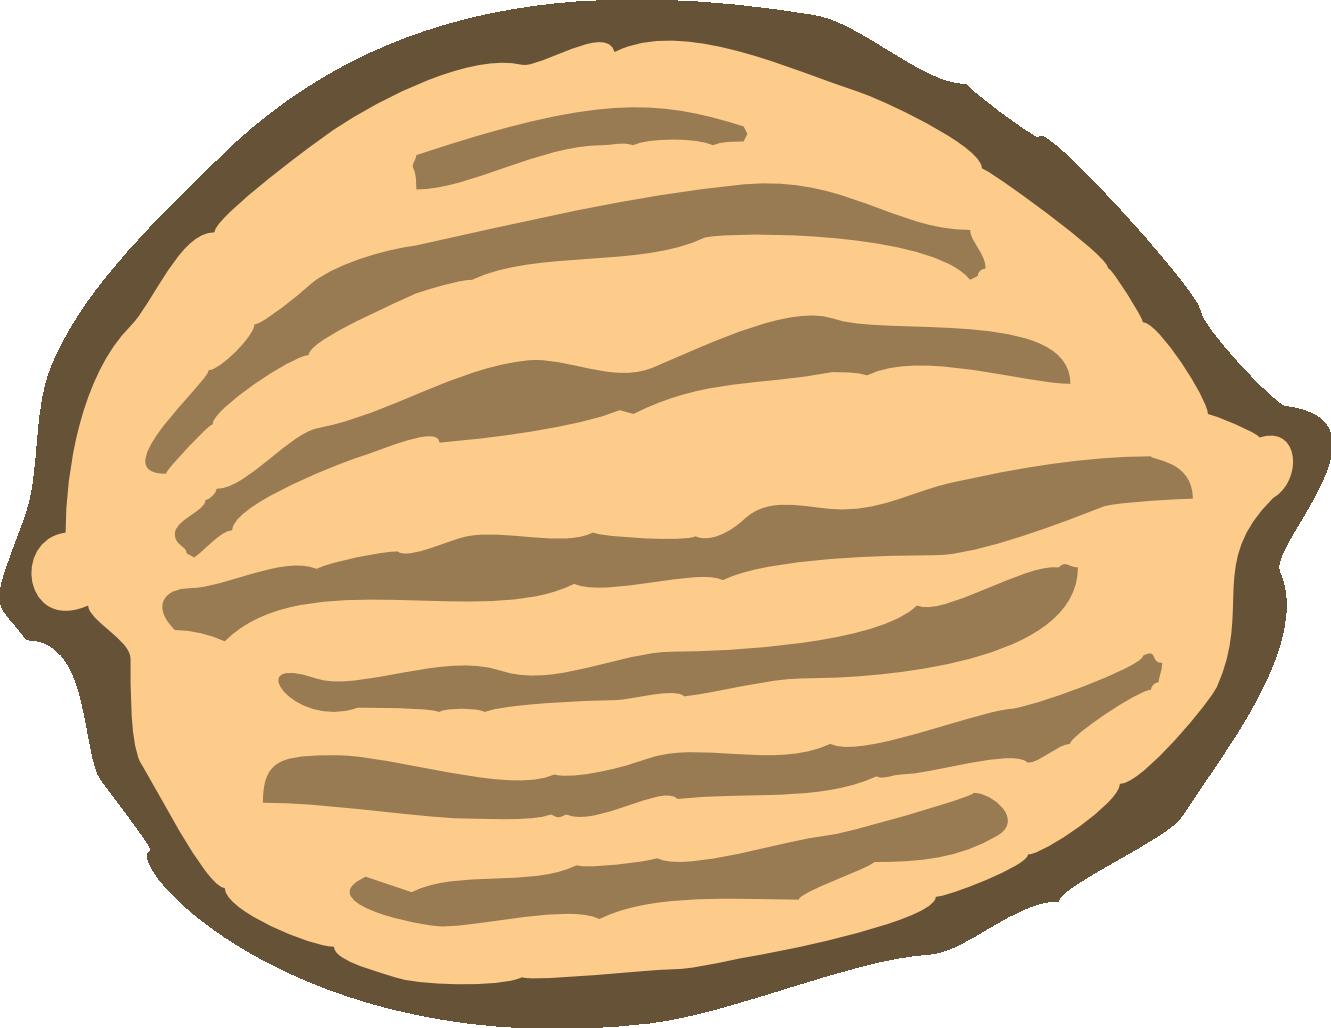 Peanut Vector